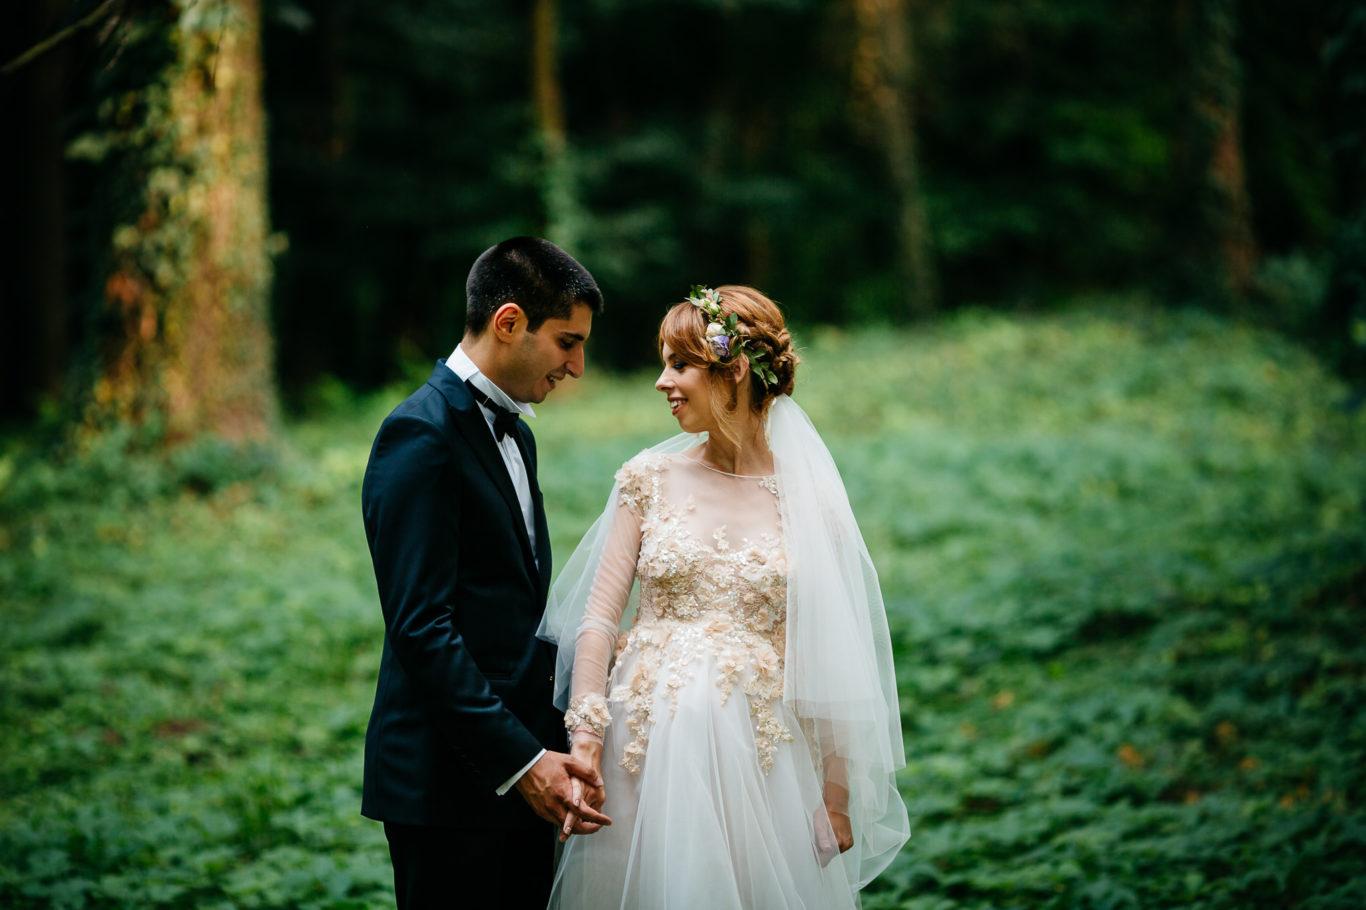 0189-Fotografie-nunta-Stirbey-Laura-Rares-fotograf-Ciprian-Dumitrescu-DCF_3409